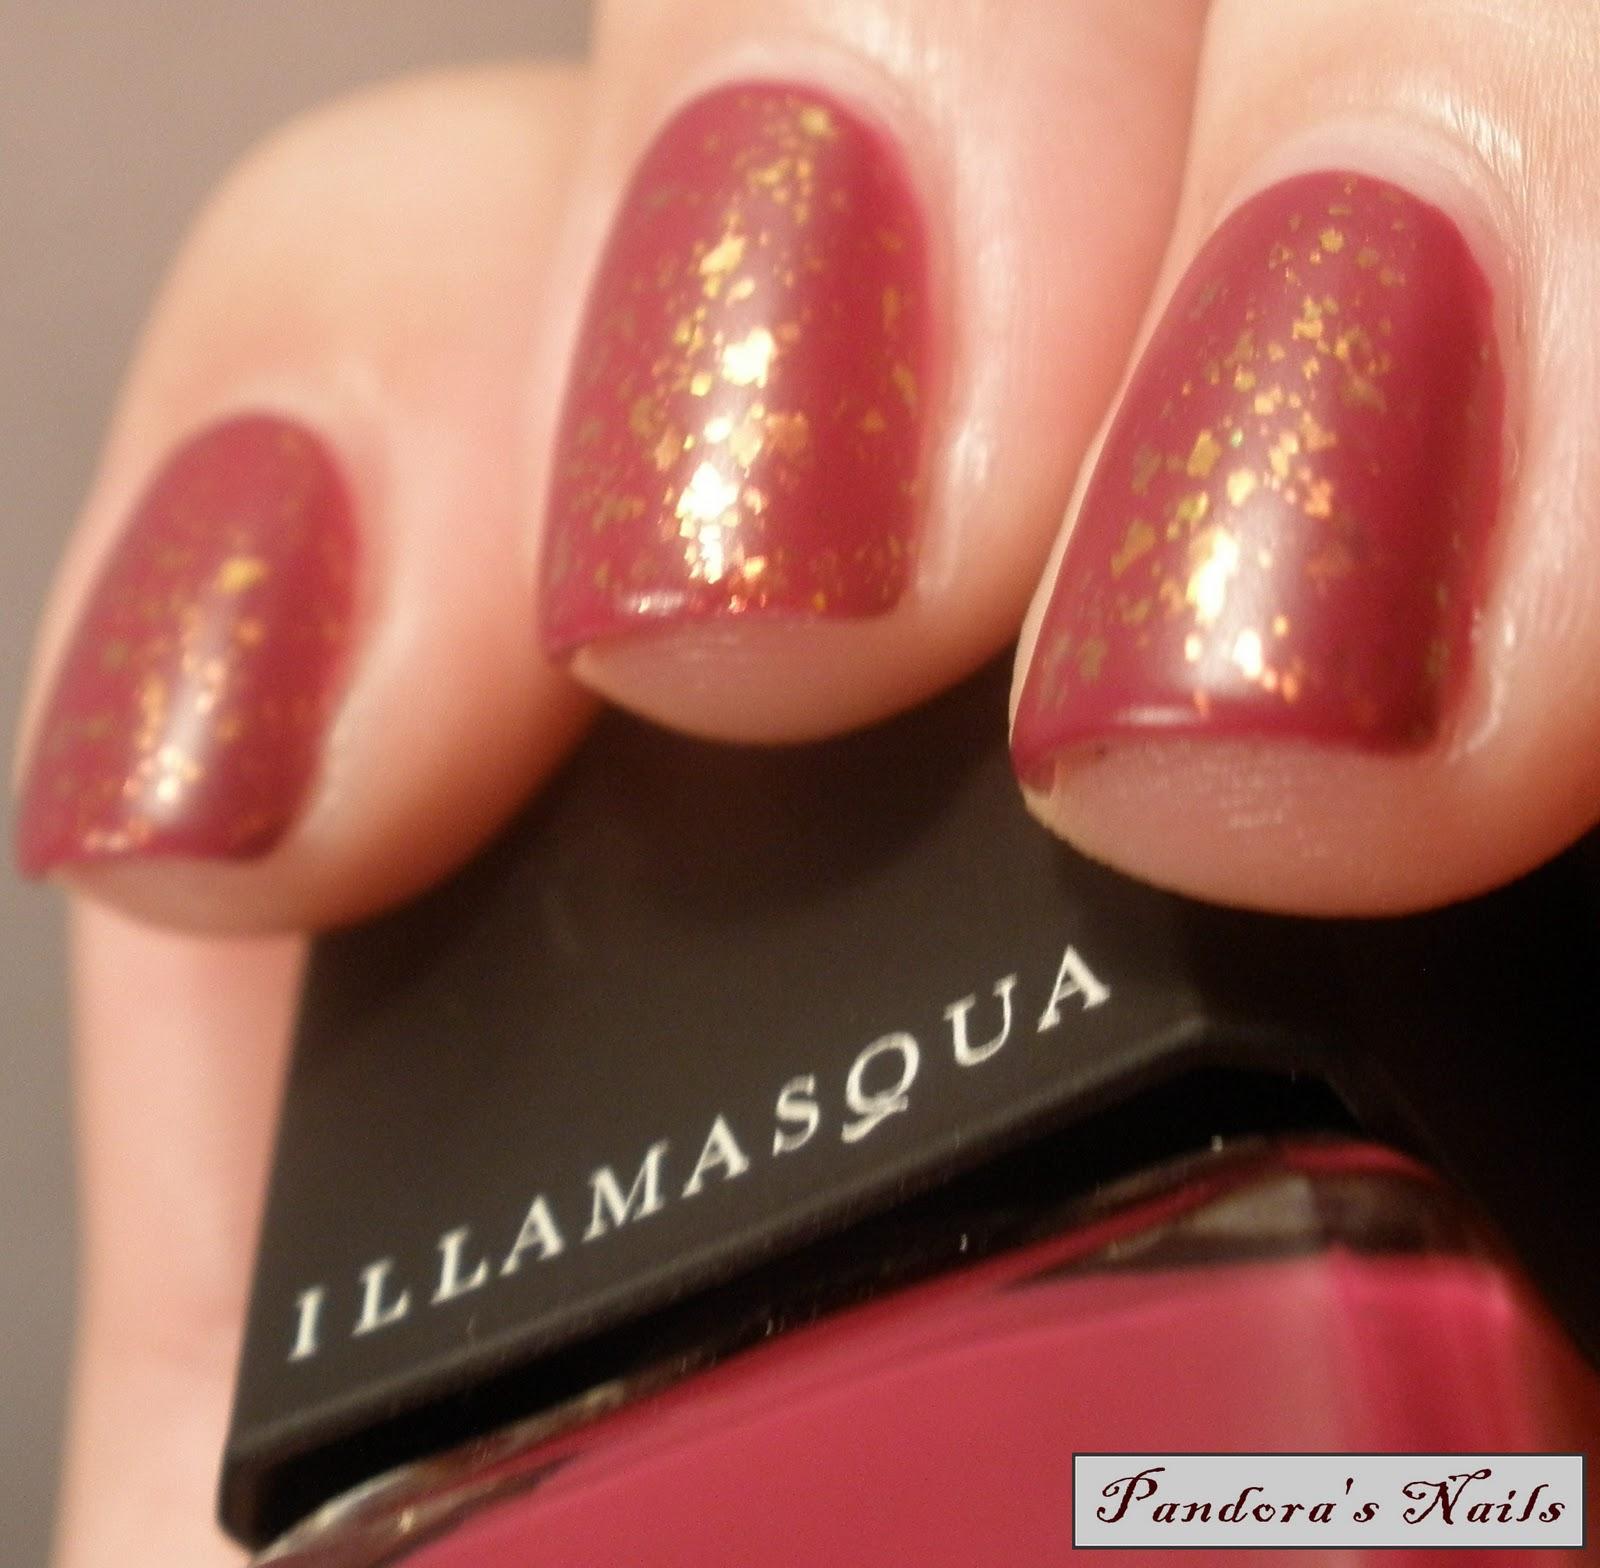 Pandora\'s Nails: Illamasqua Vice and Nubar 2010